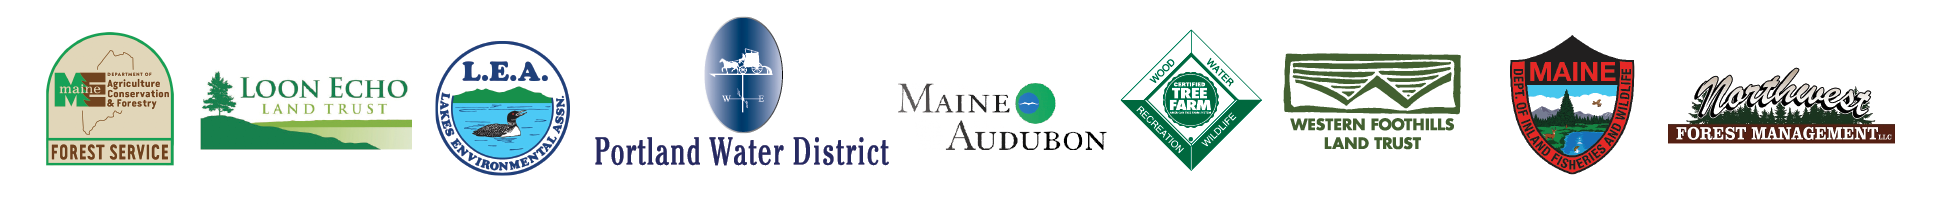 event organizers logos